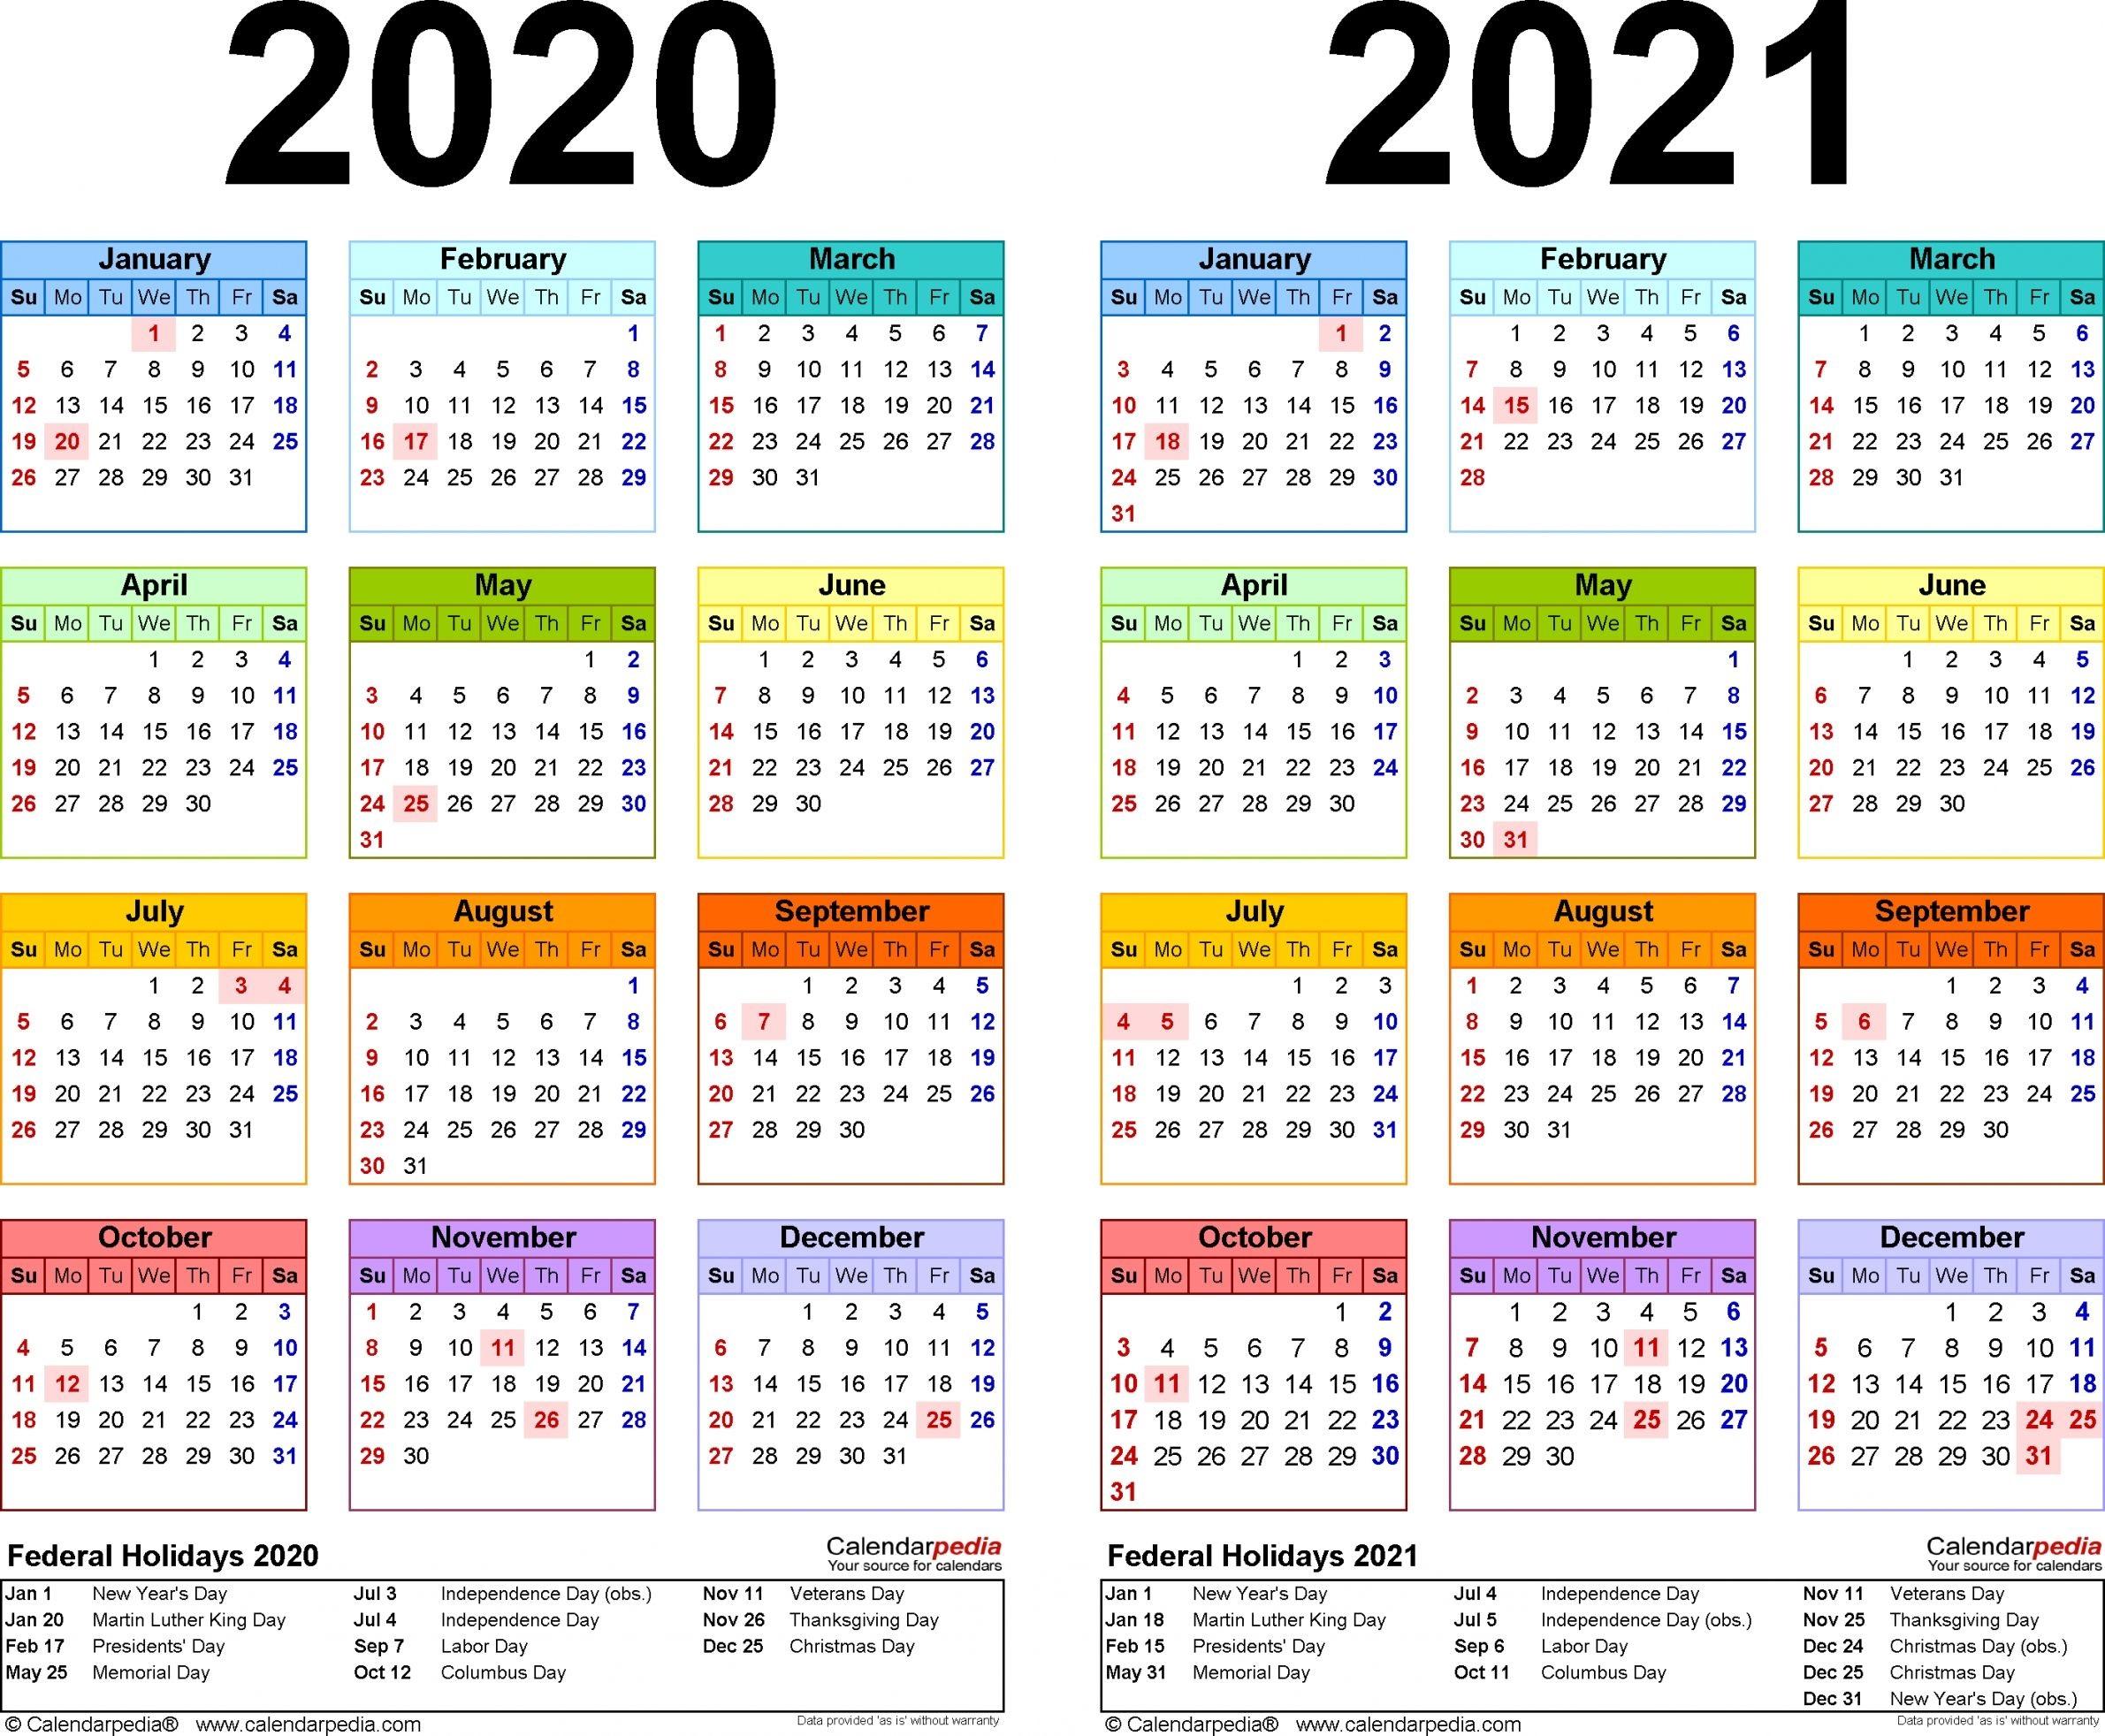 000 Top School Year Calendar Template High Resolution  Excel 2019-20 WordFull